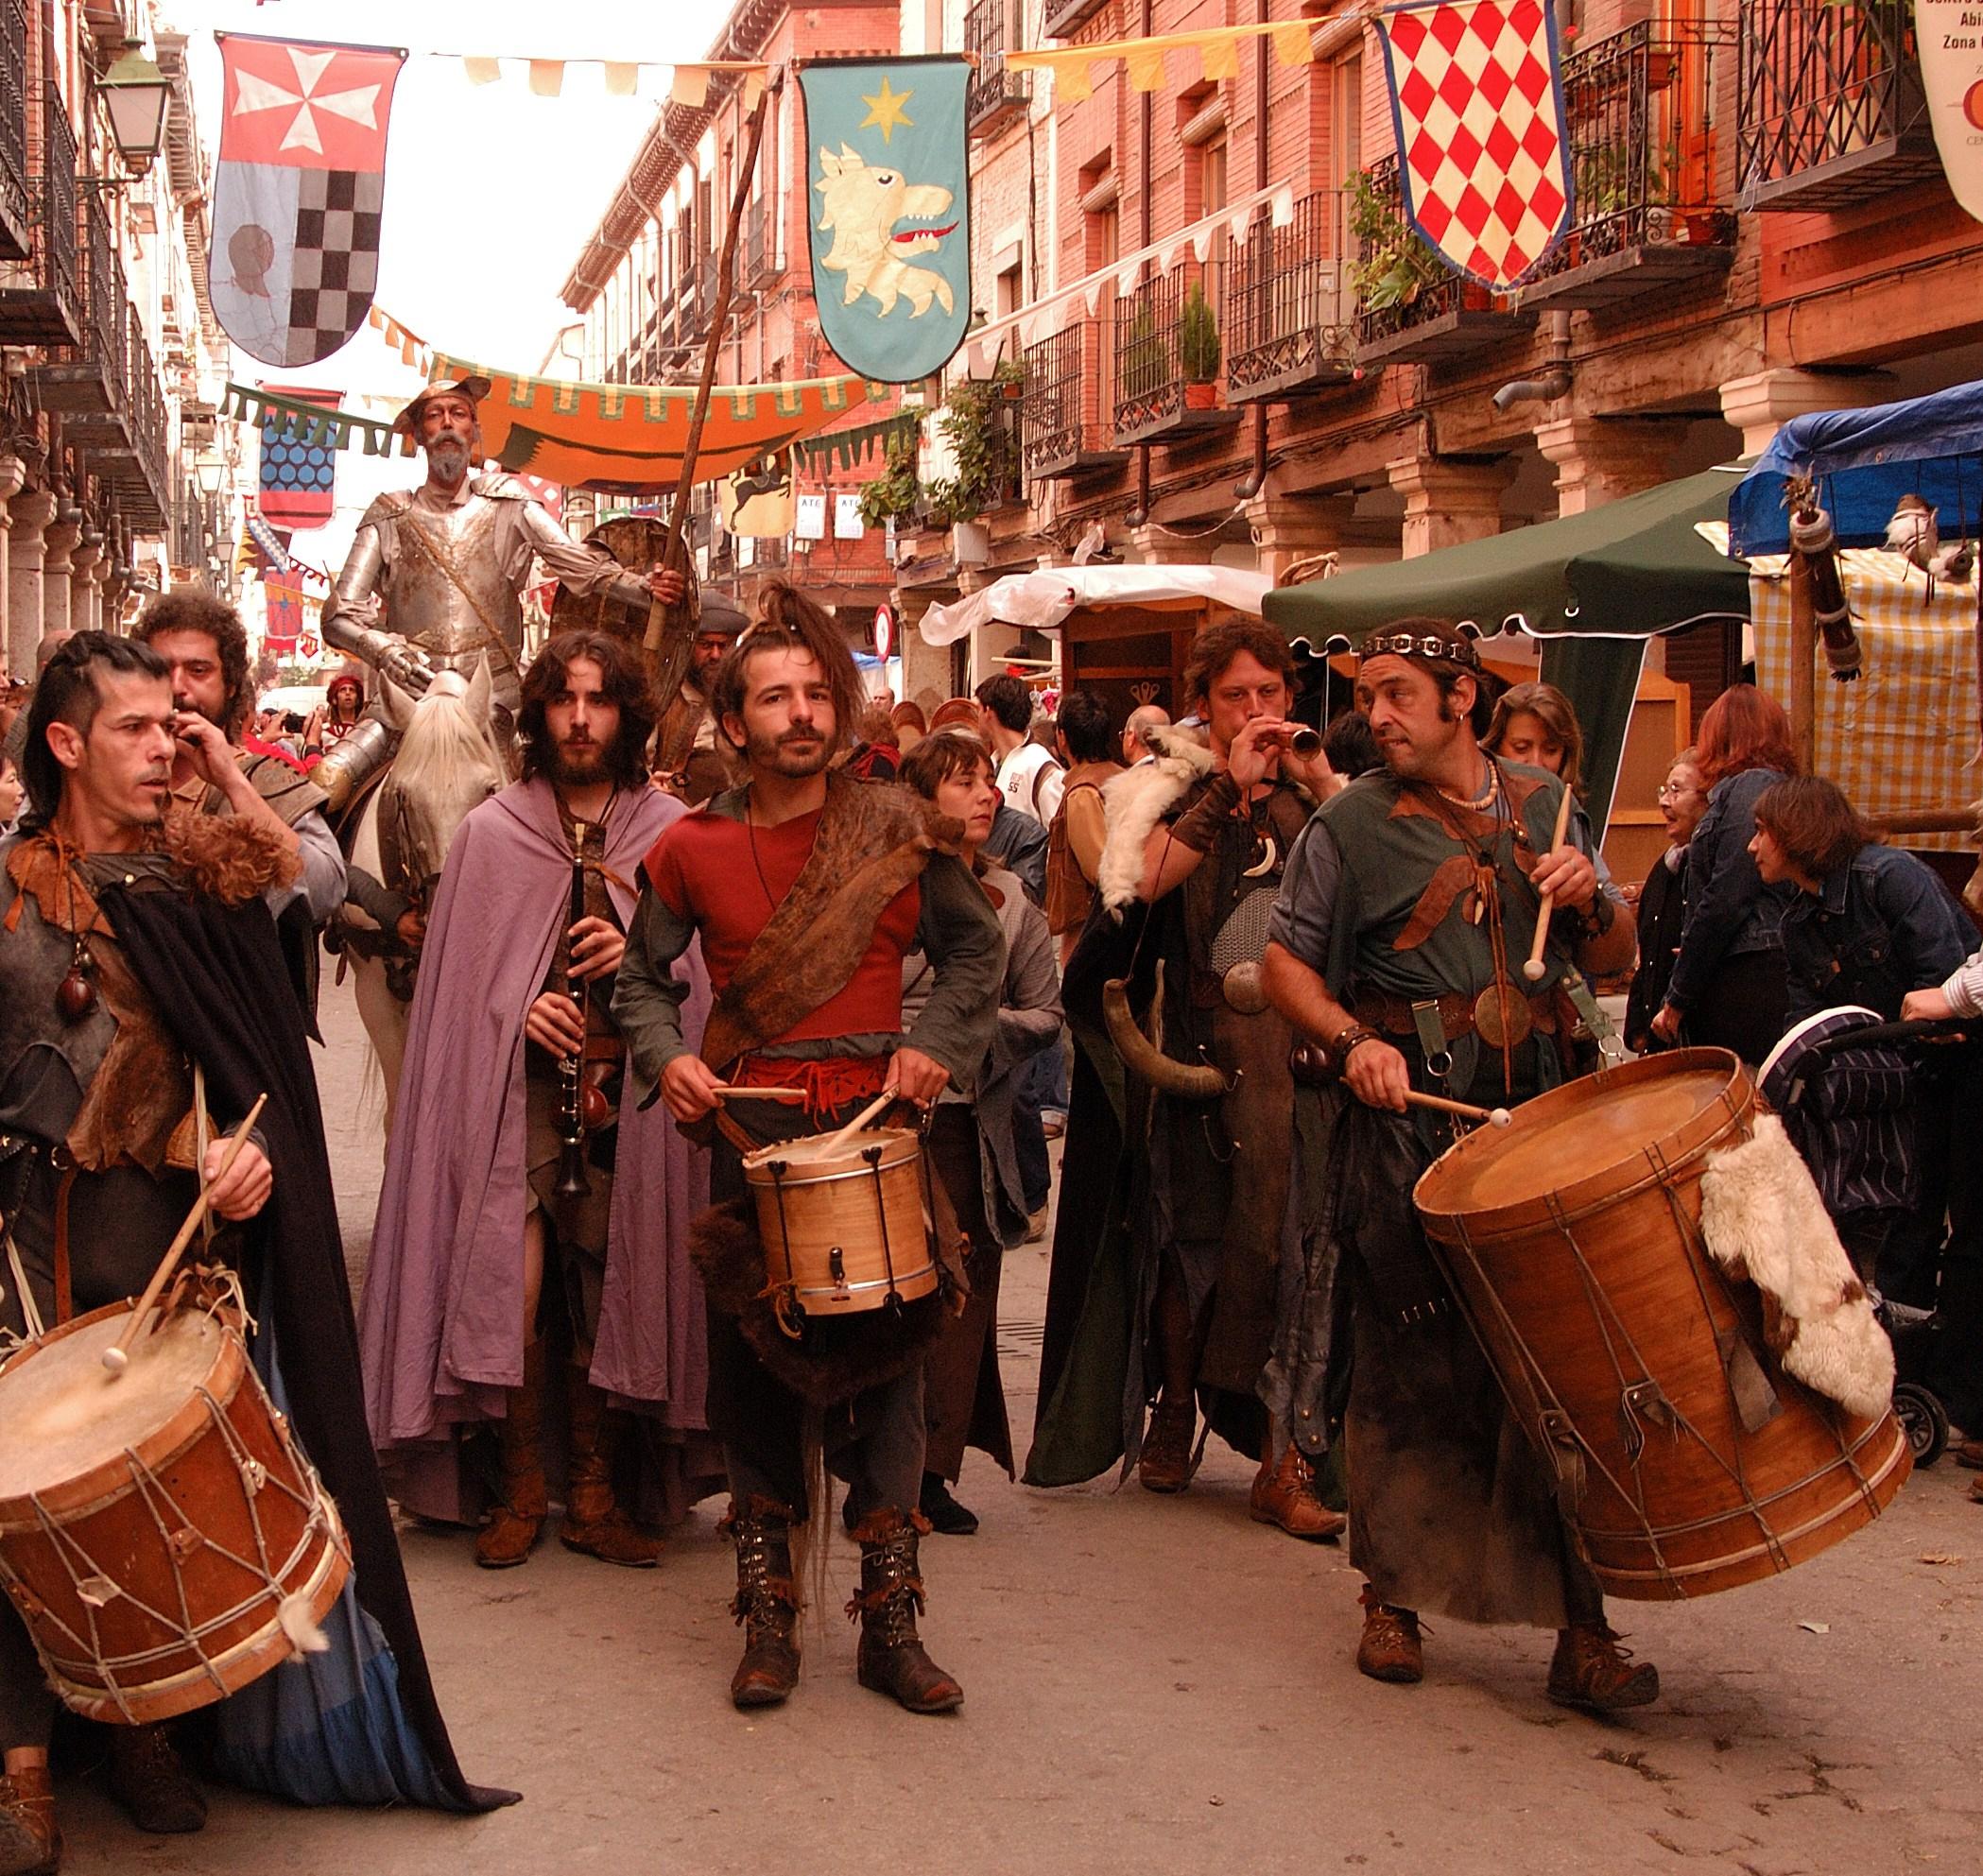 Semana Cervantina de Alcalá de Henares, Fiesta de Interés Turístico Nacional